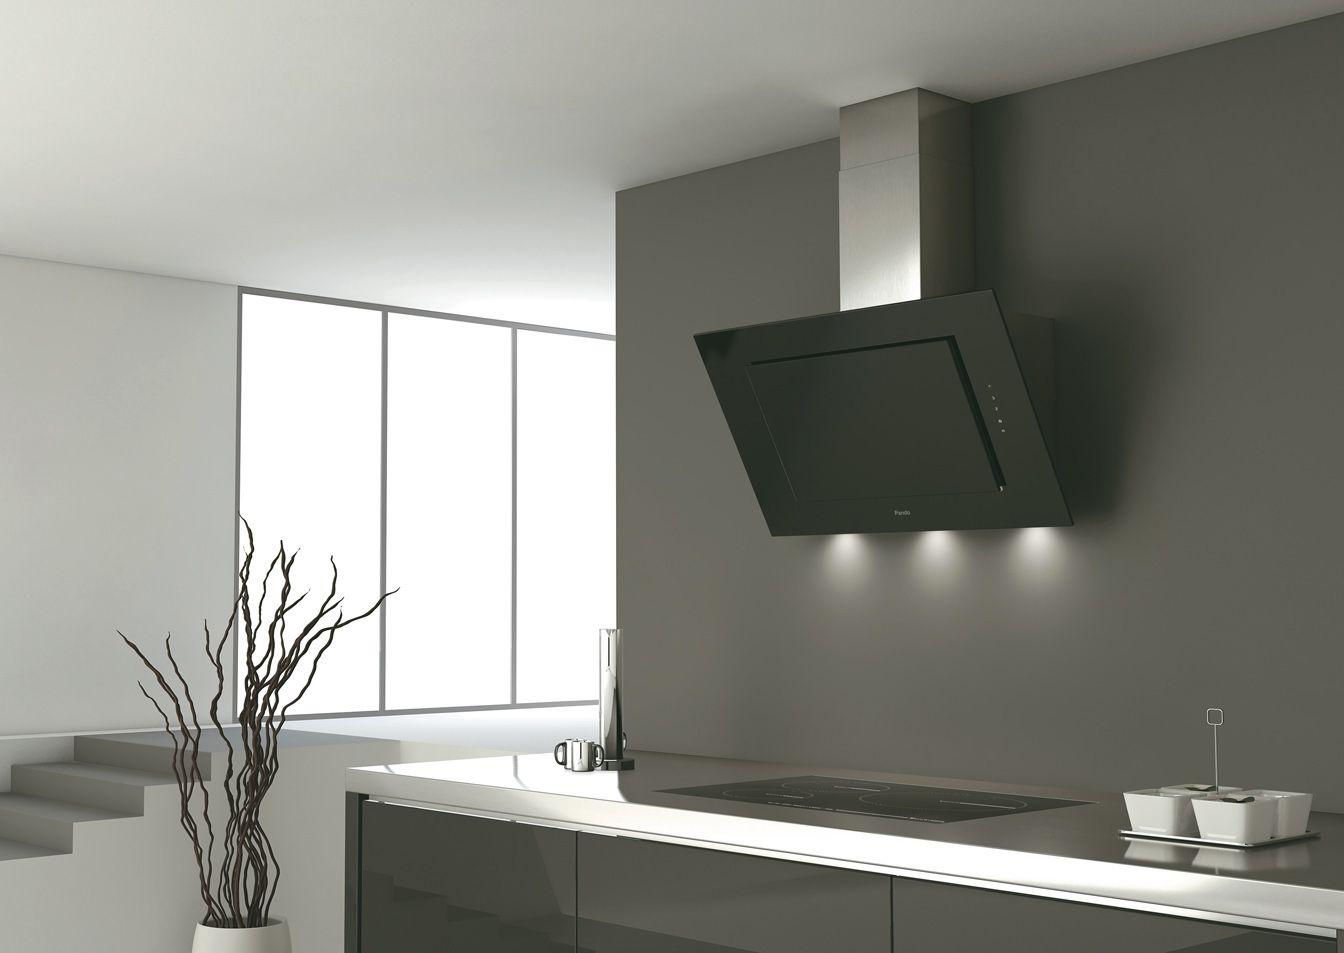 Campana extractora pando p732 campanas de pared campanas de cocina cocinas modernas - Campanas de cocina ...